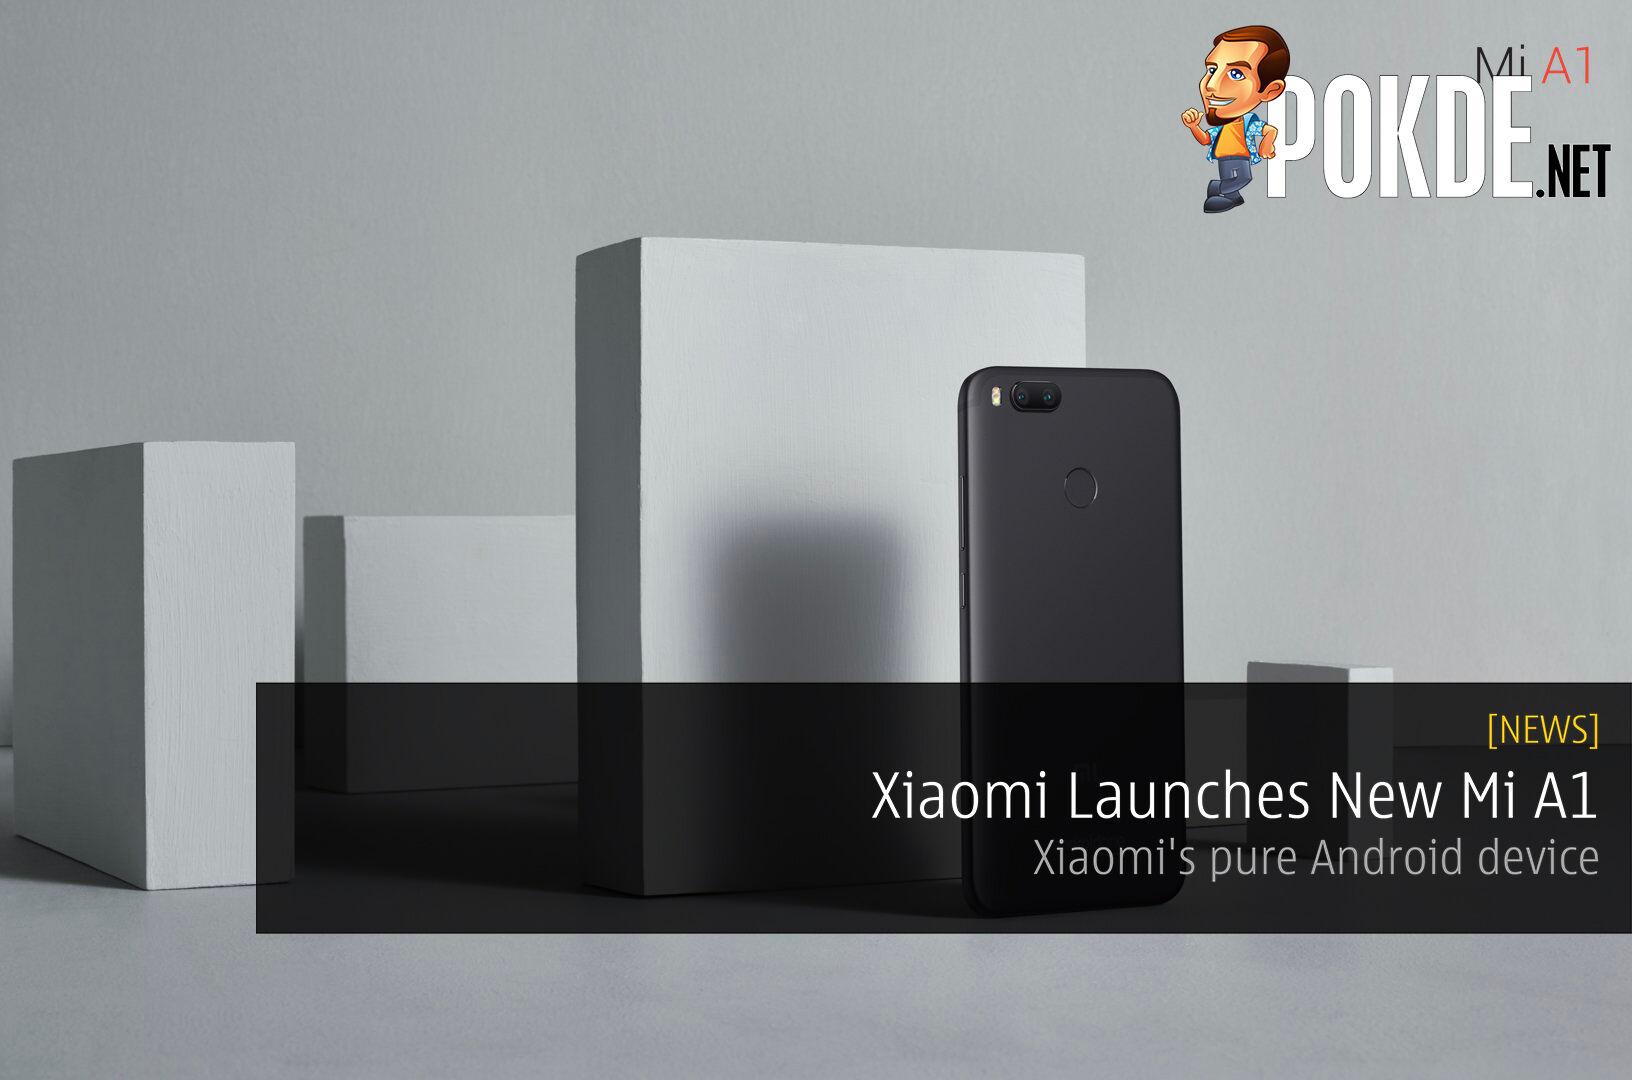 Xiaomi Launches New Mi A1 - Xiaomi's pure Android device 18